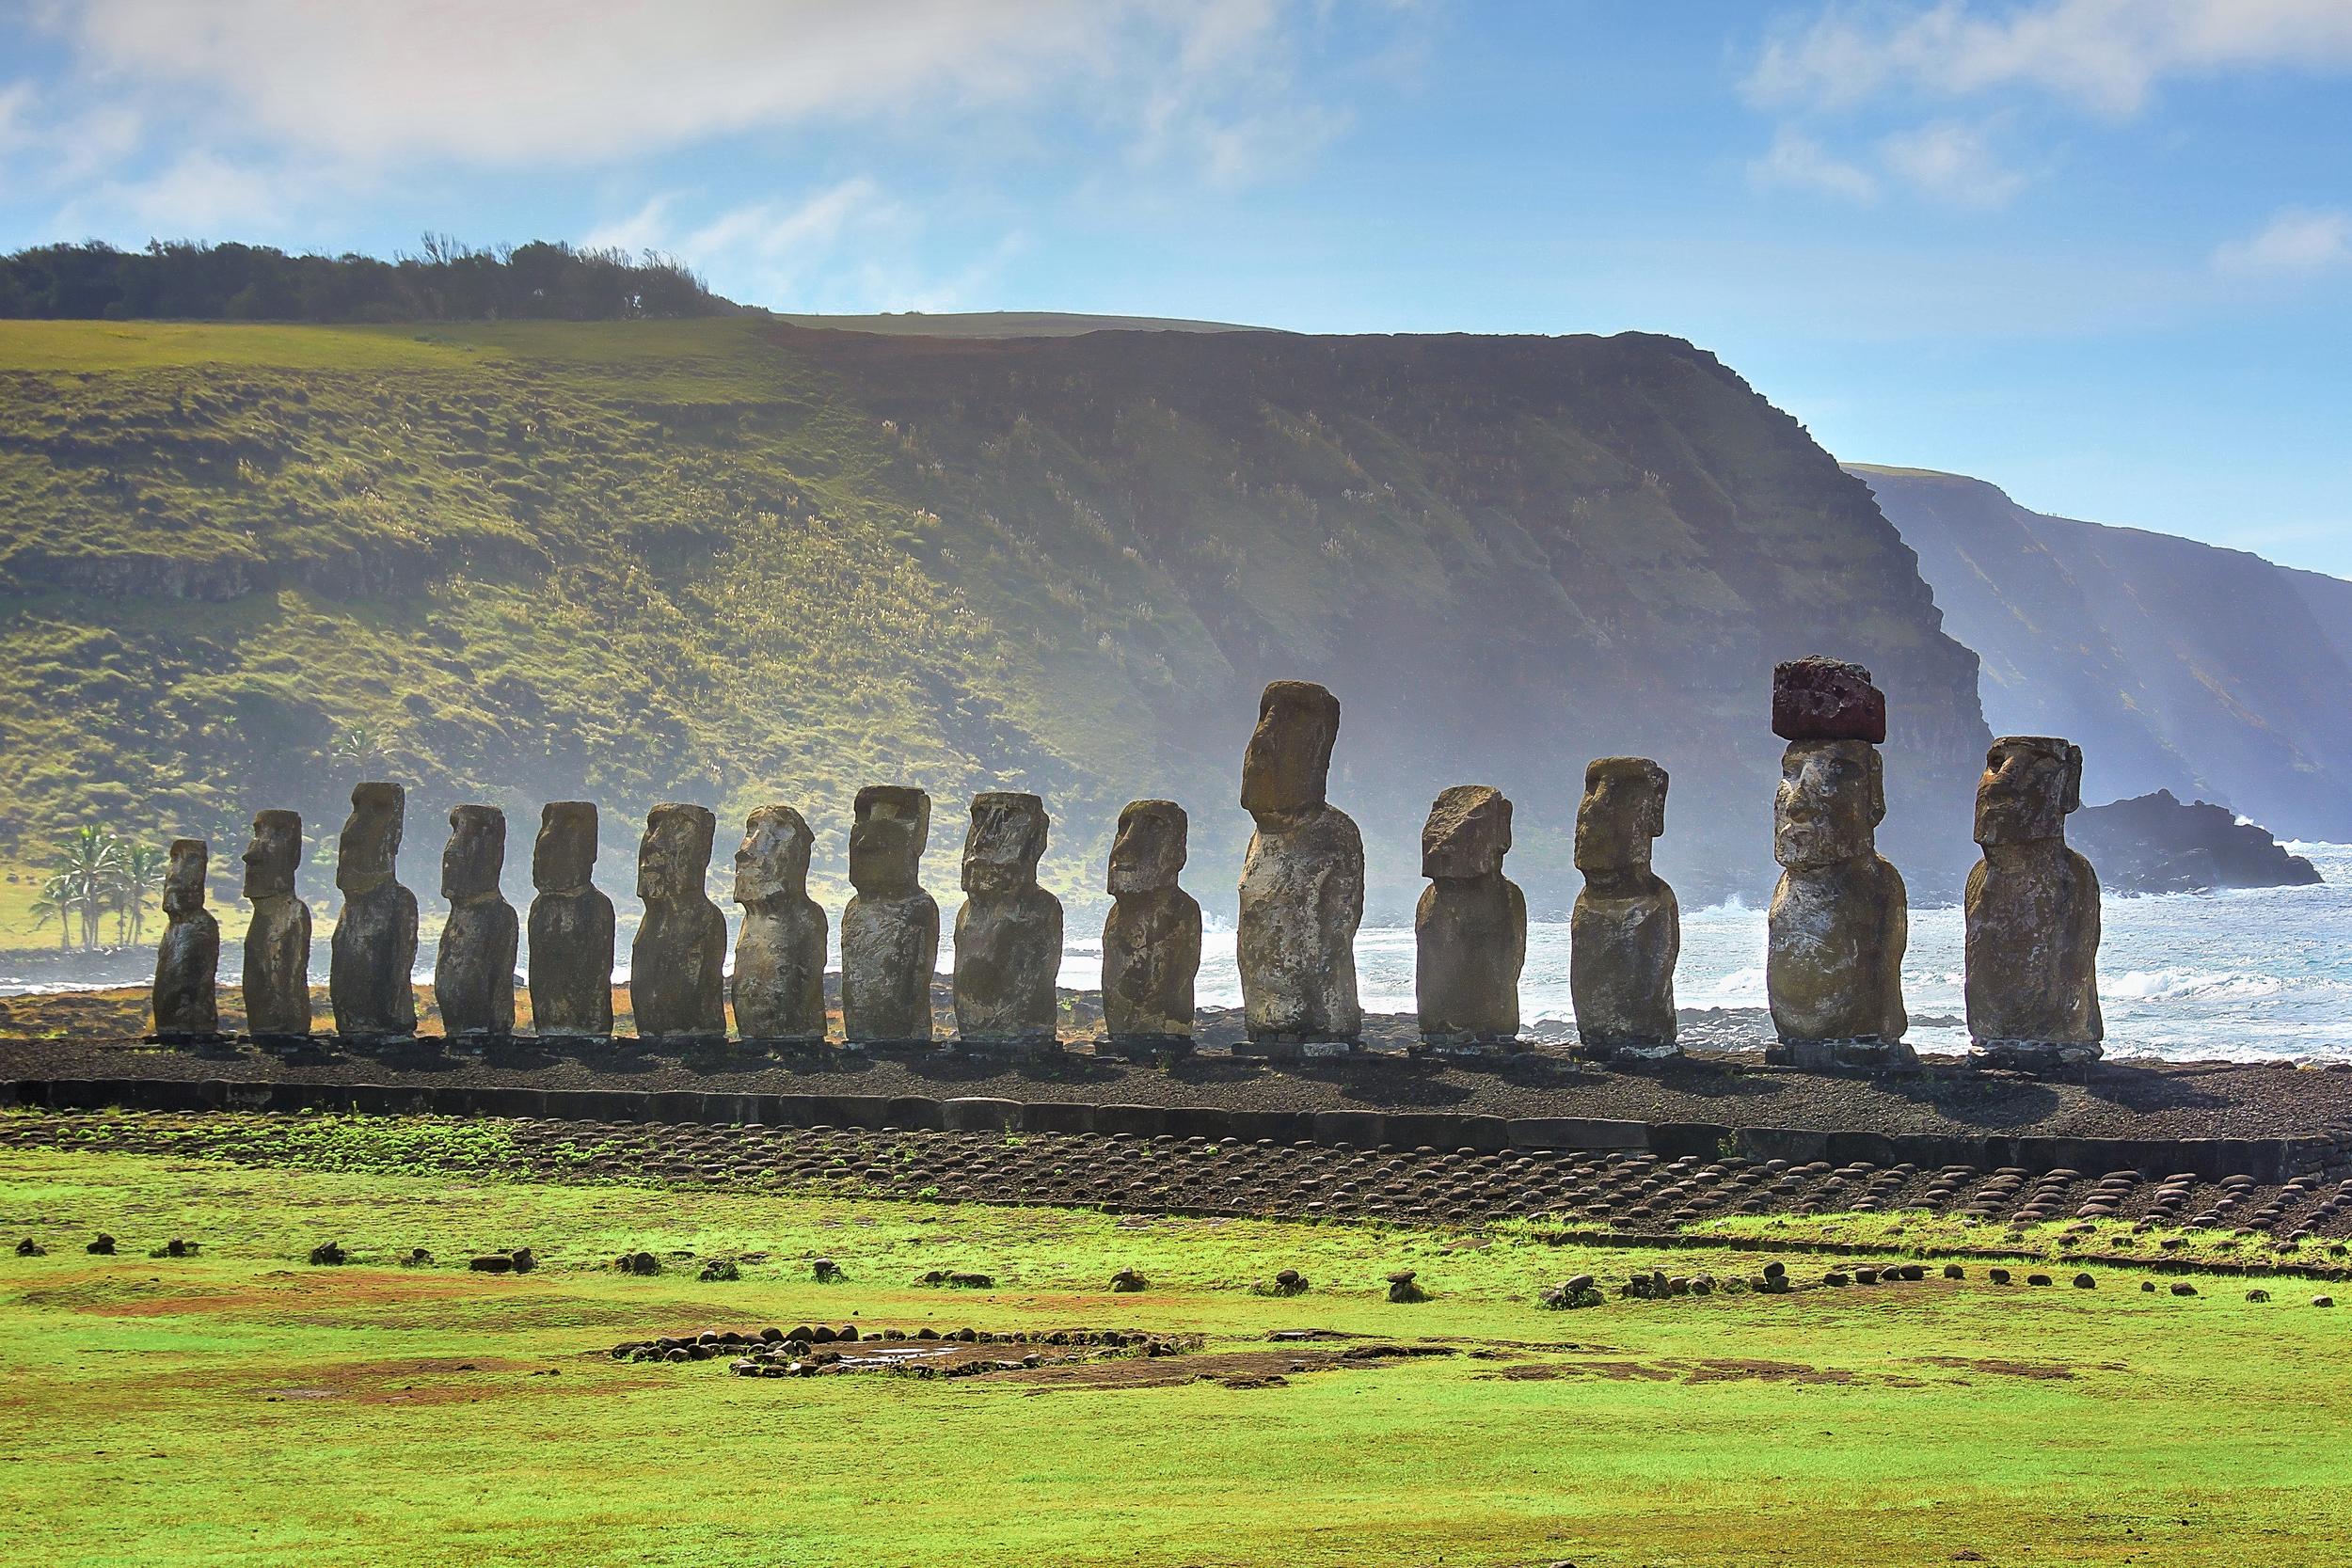 Mystical Moai - Ahu Tongariki (Easter Island, Chile)